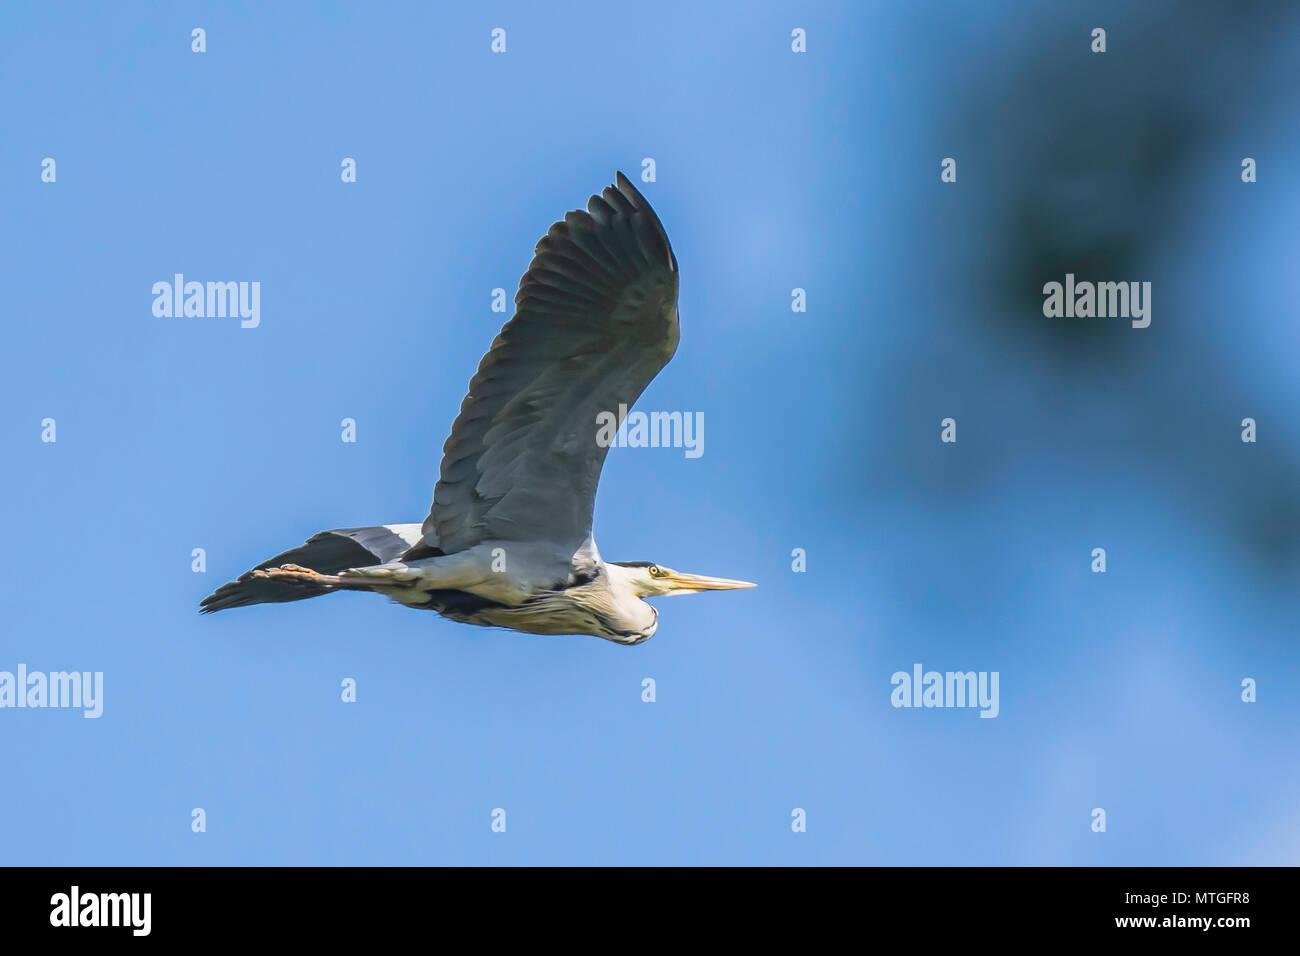 Ardea cinerea, Grey heron in flight.Stunning british wildlife.Nature Uk.Natural world conservation.Large bird flying above lake to find nesting place. - Stock Image